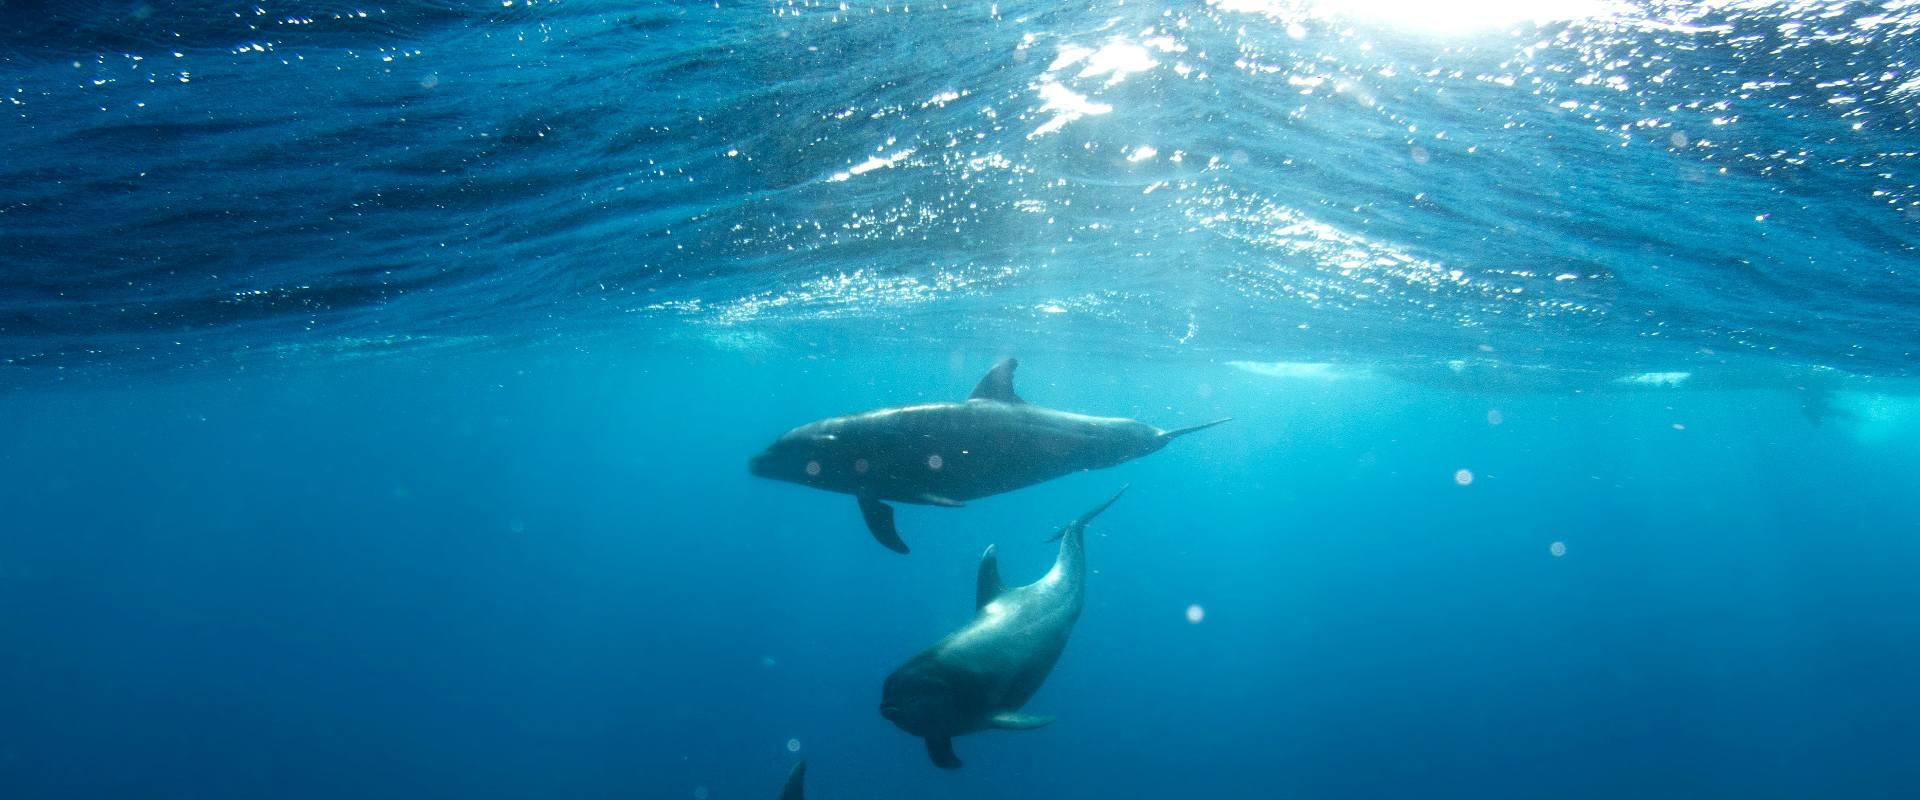 Delfín o buitre